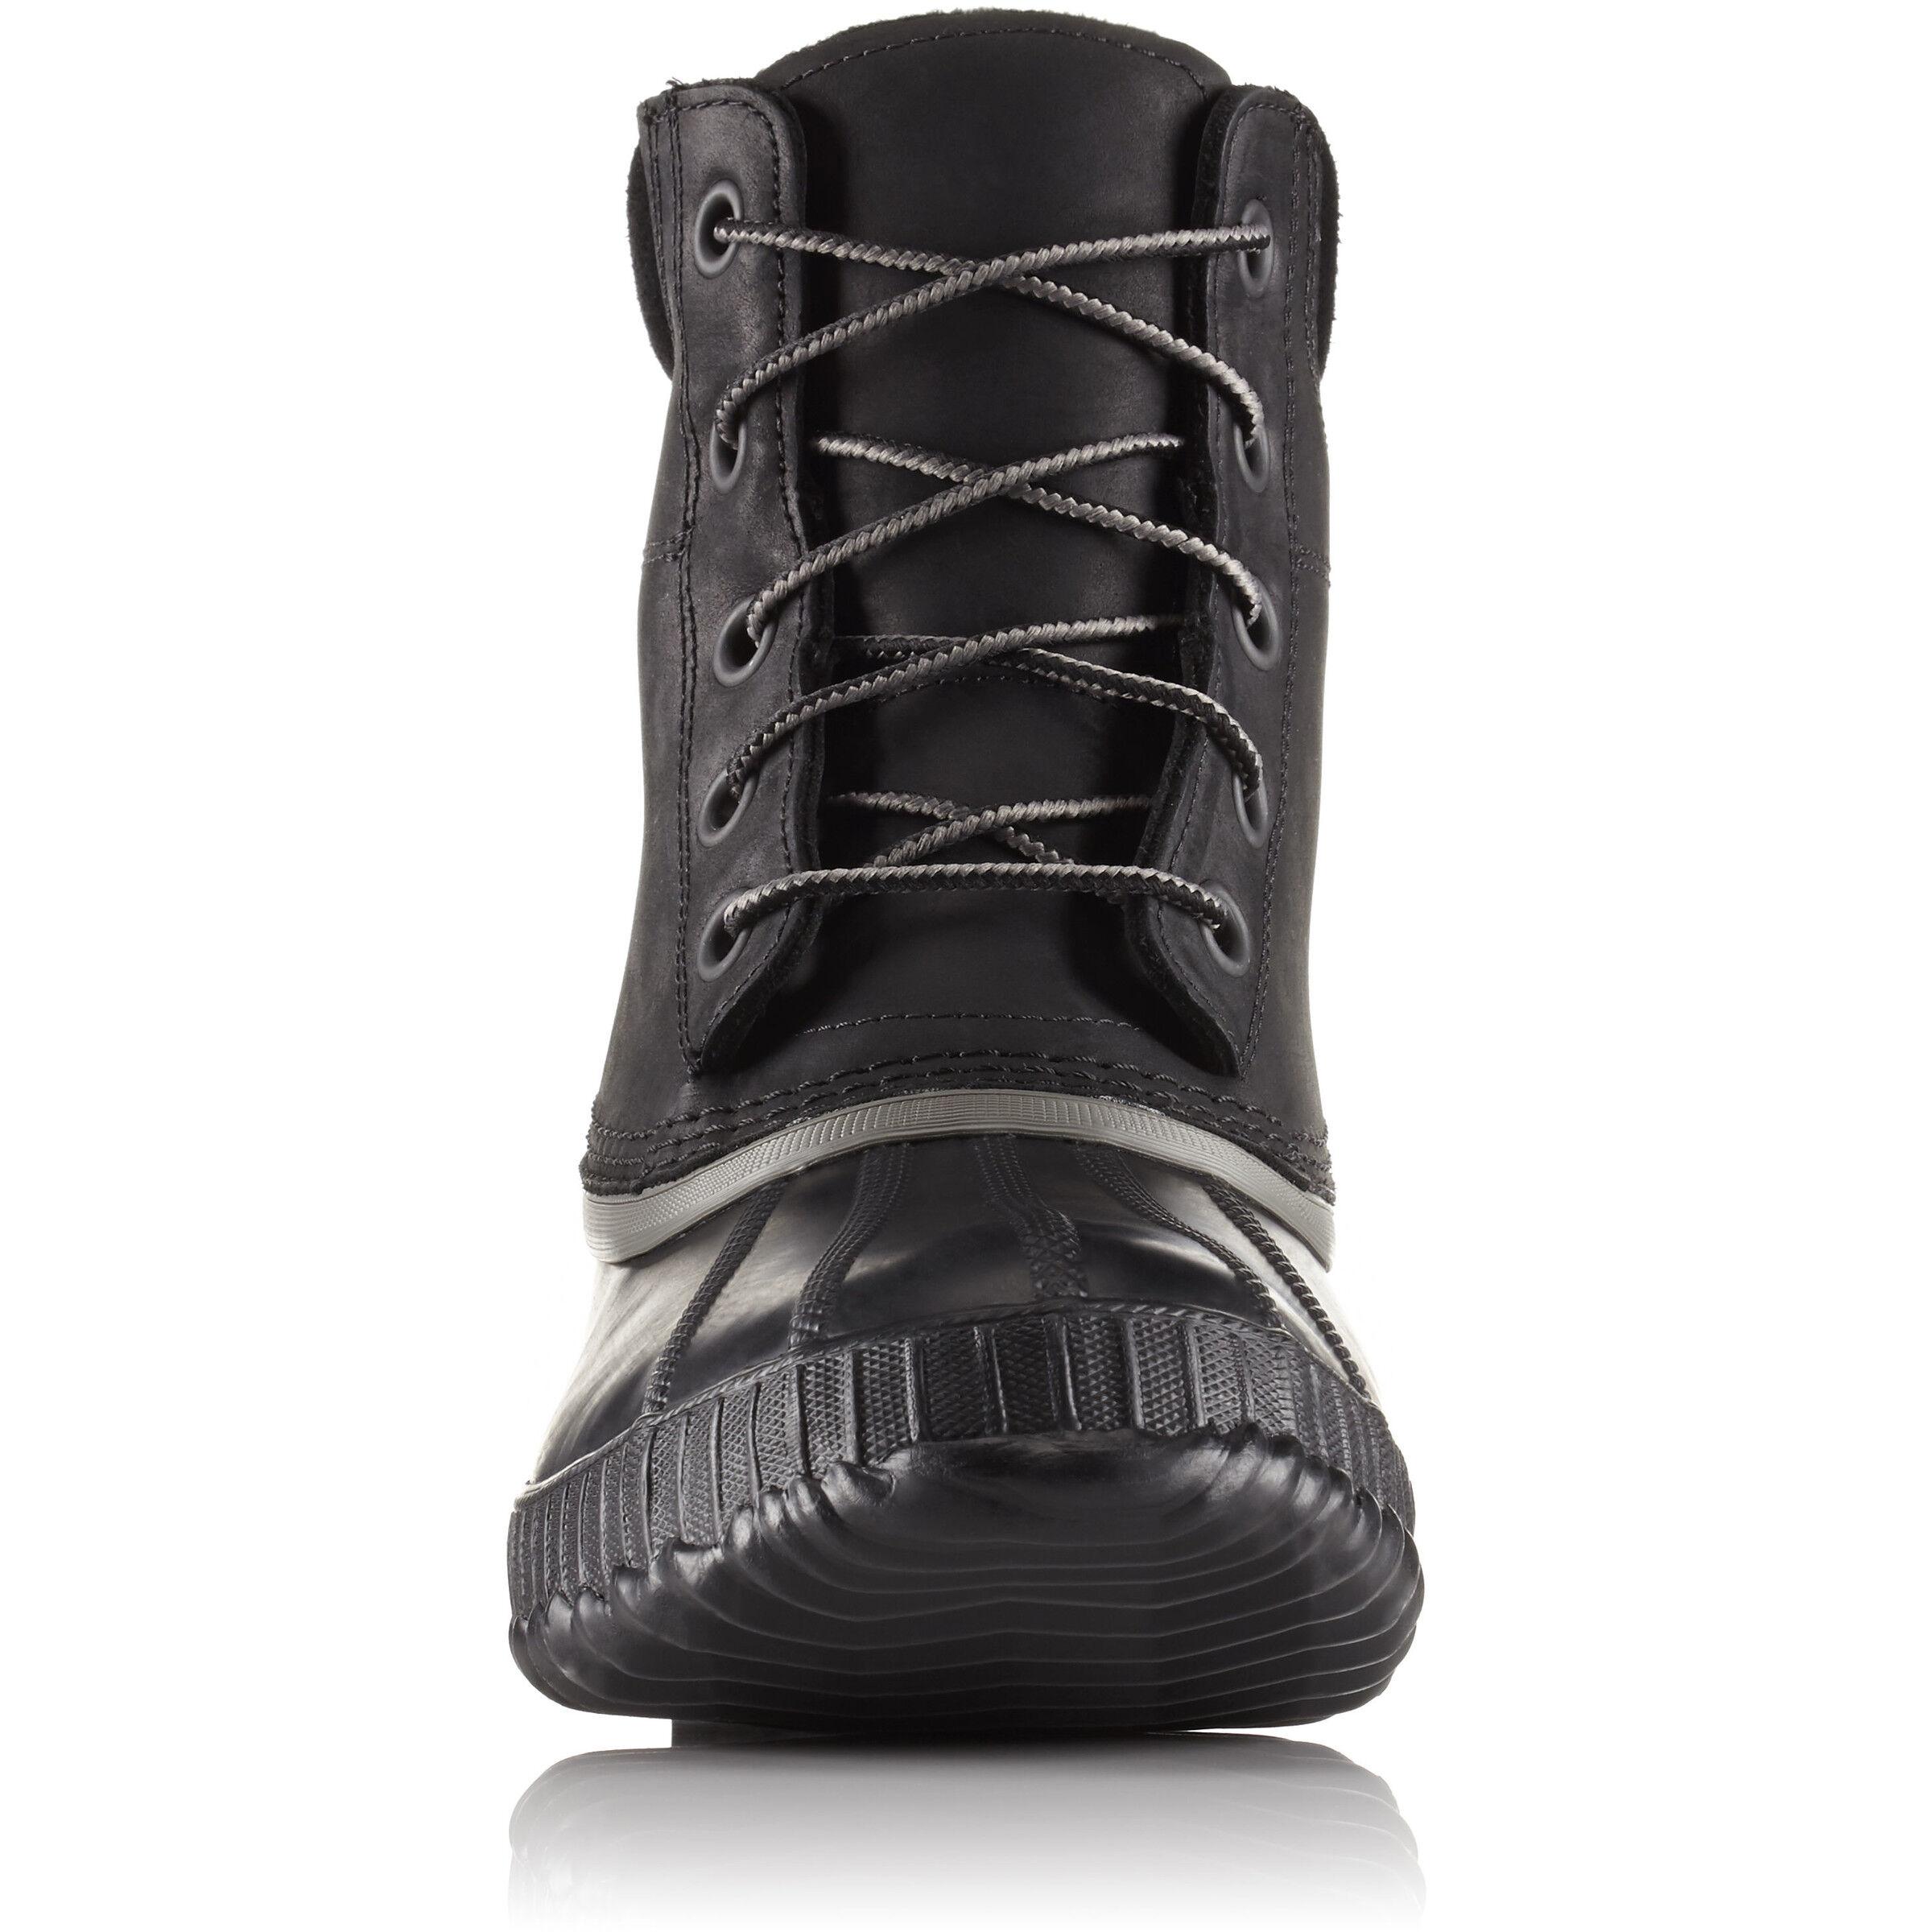 Herren Blackblack Boots Sorel Cheyanne Ii VpzMqSUG